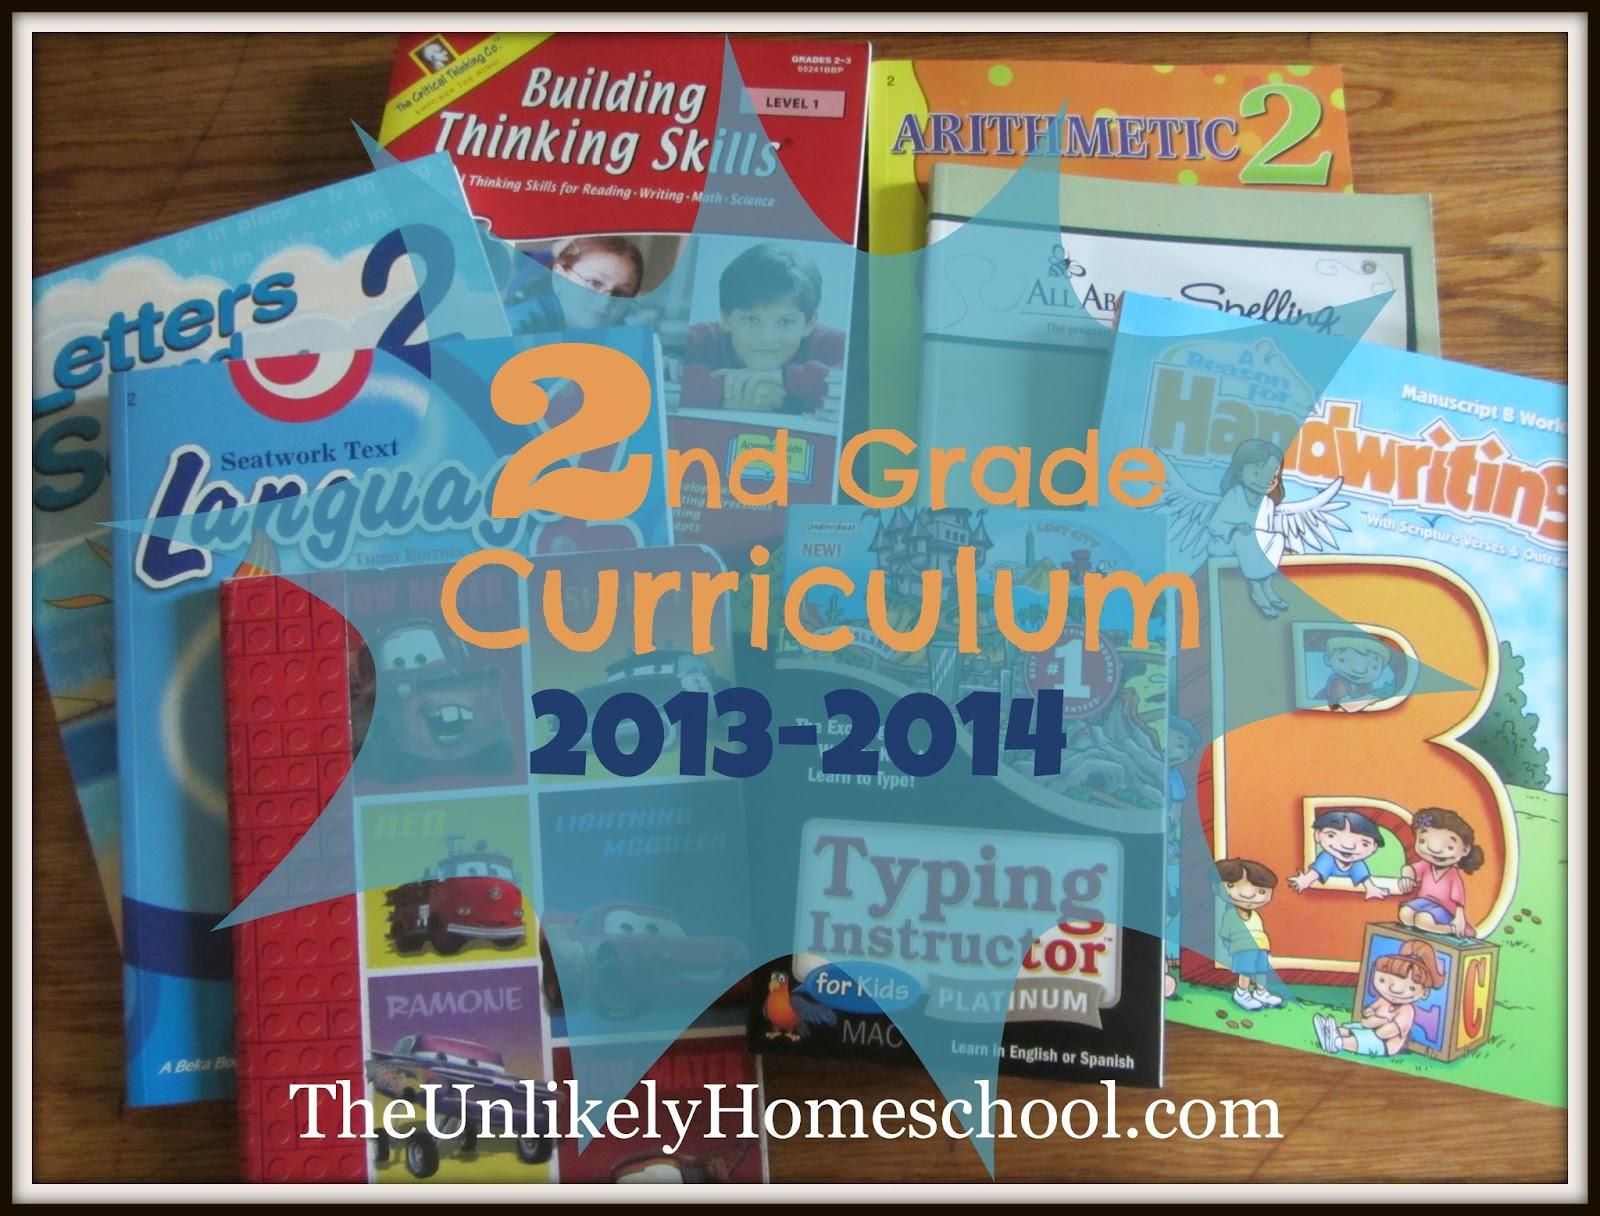 The Unlikely Homeschool August